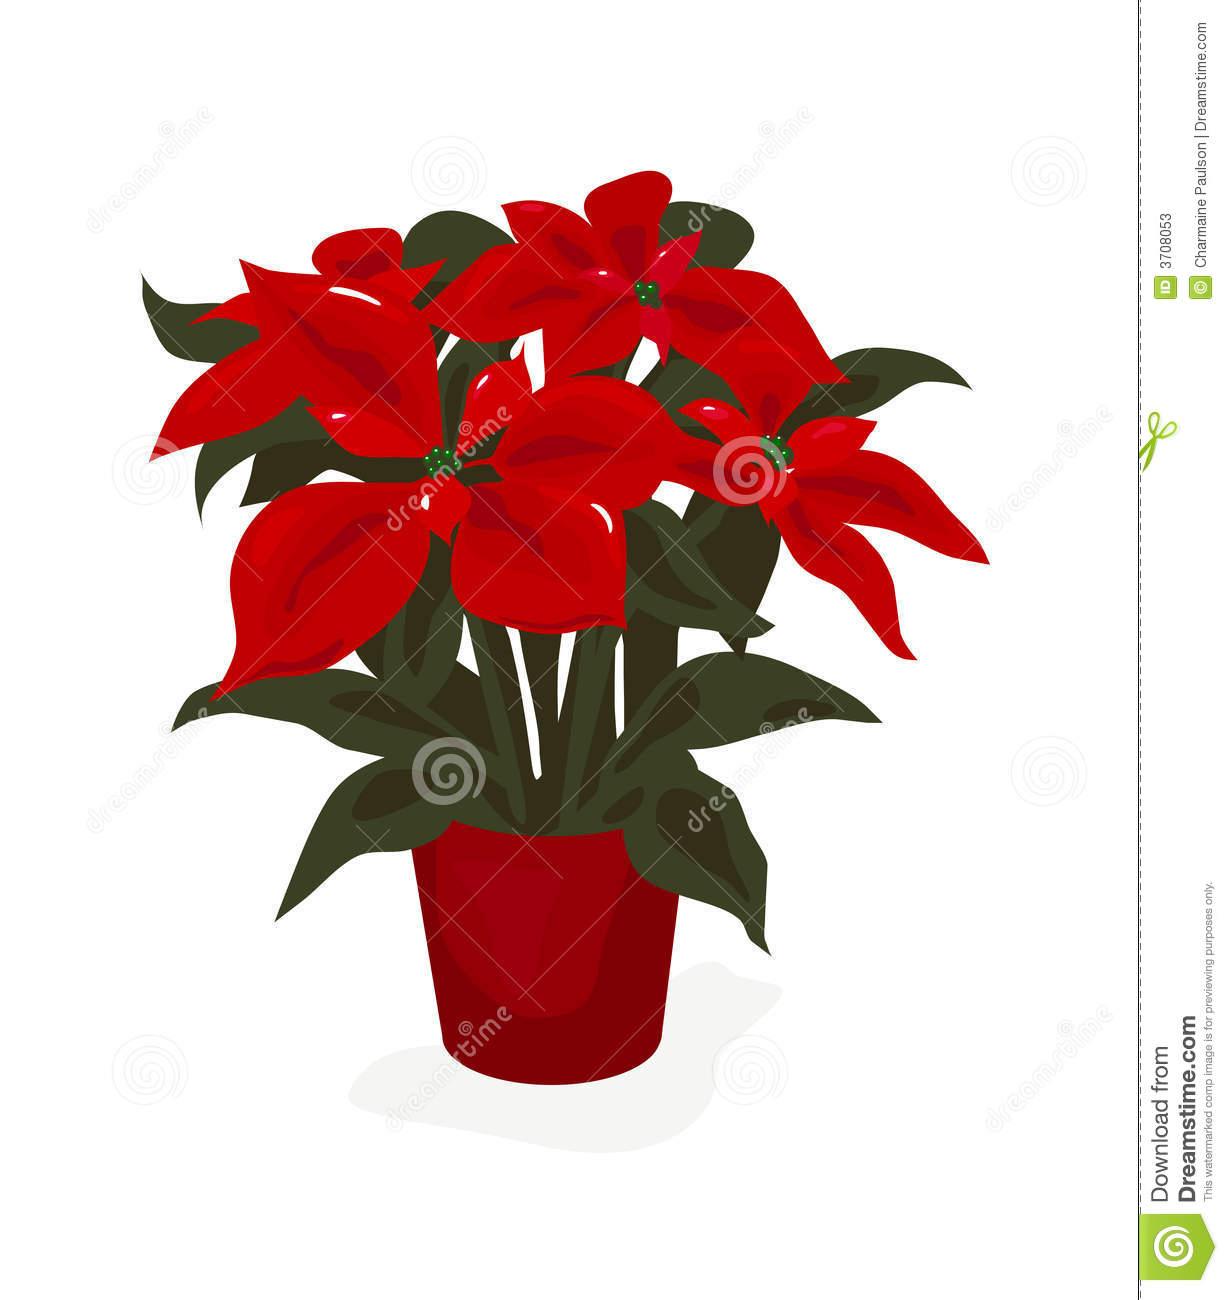 Poinsettia Clipart.